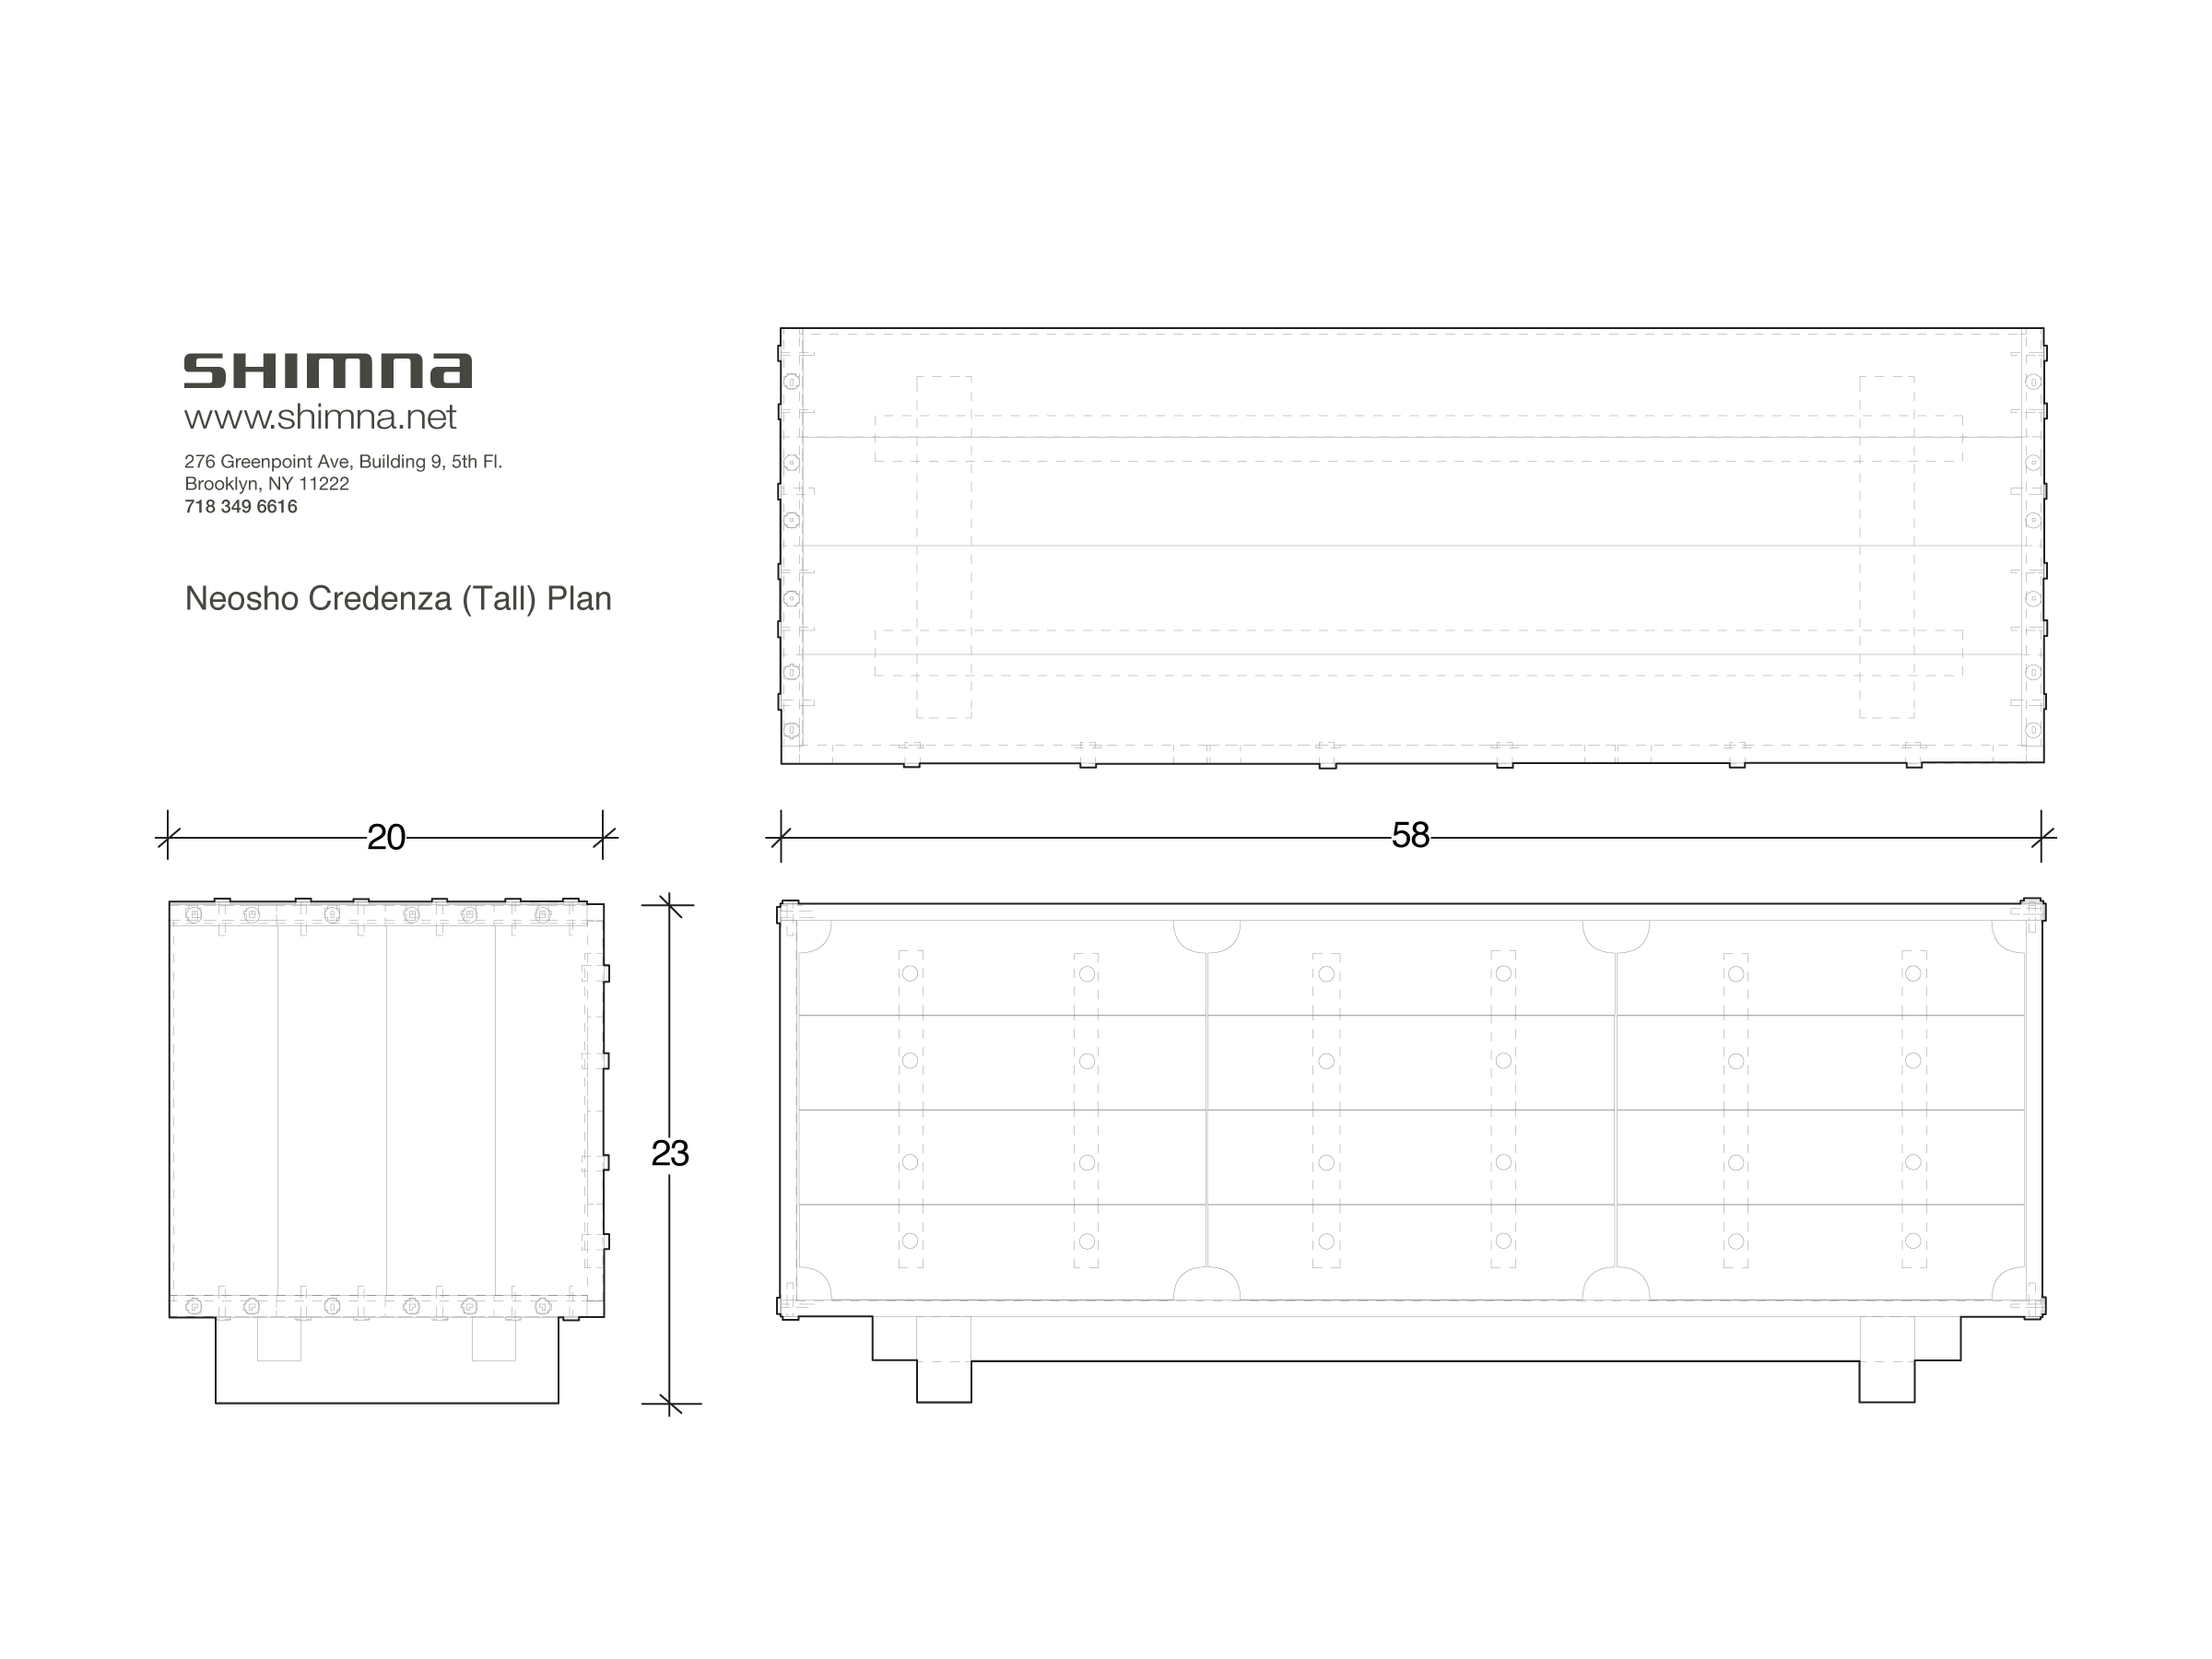 Dimensional Plan Drawing